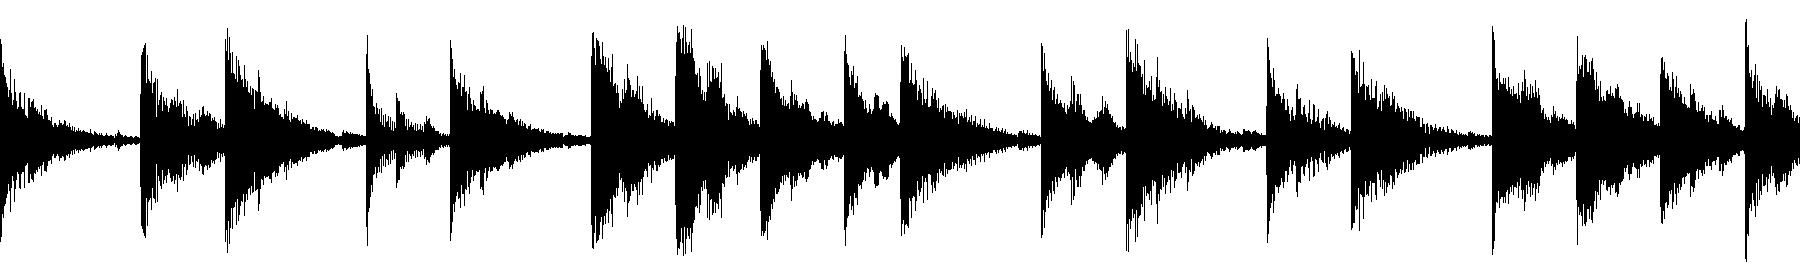 dts chordlp 53b cm7 wet